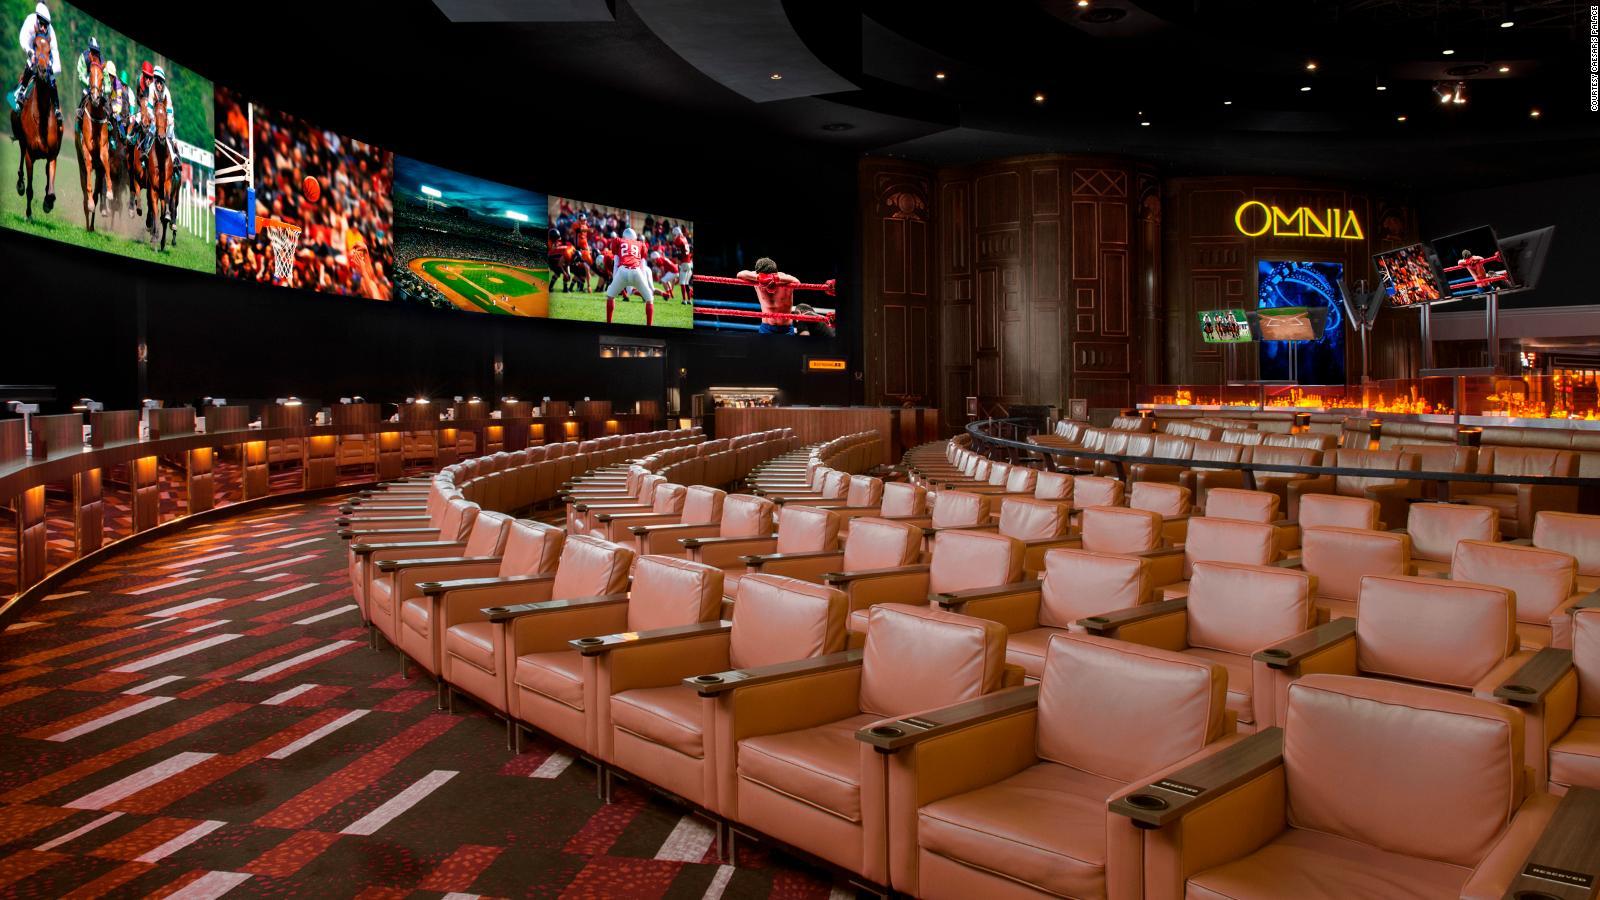 Caesars palace gambling lessons procter and gamble graduate program